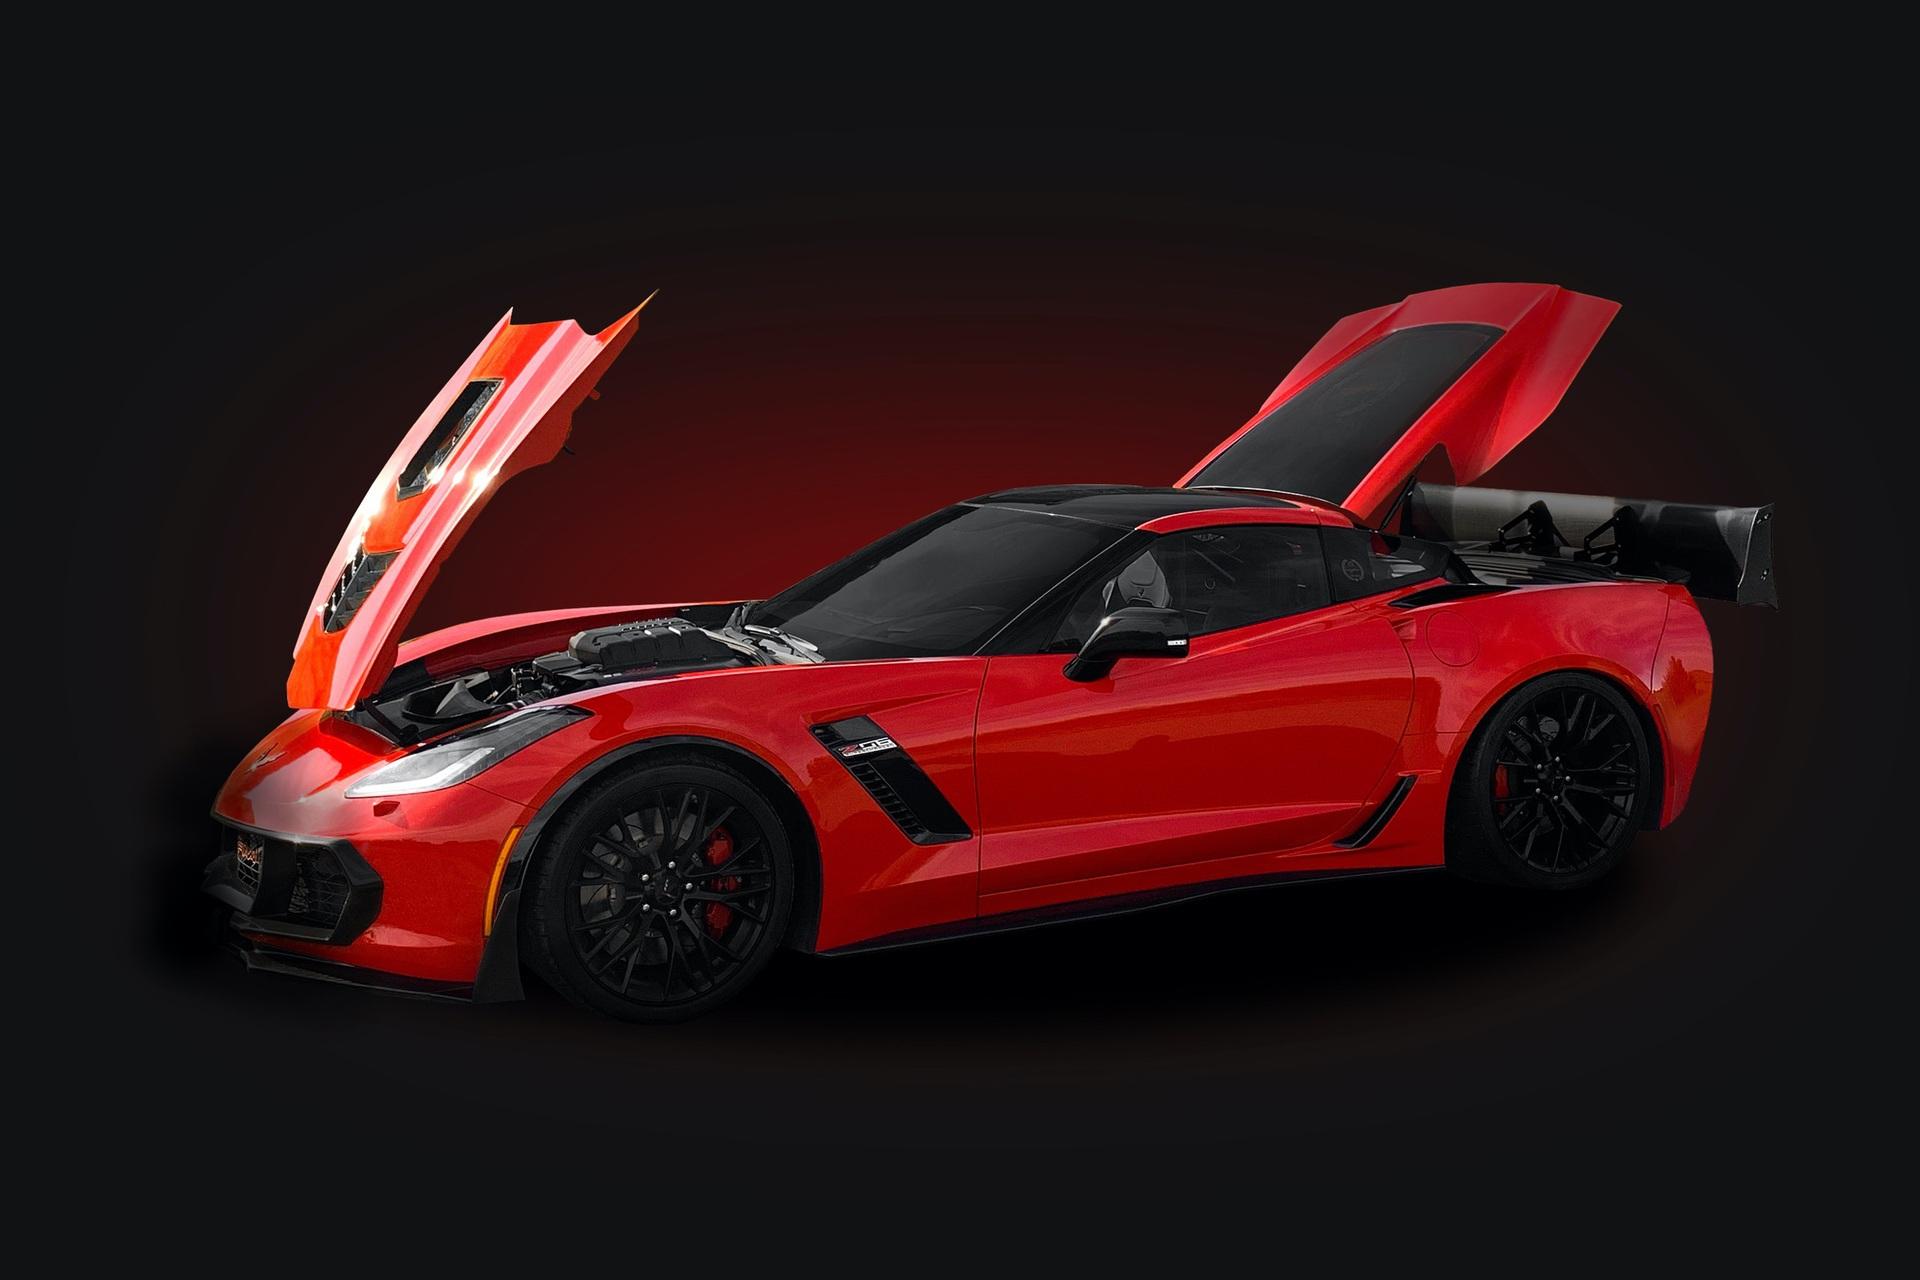 Callaway_C7_Corvette_limited_edition_0002